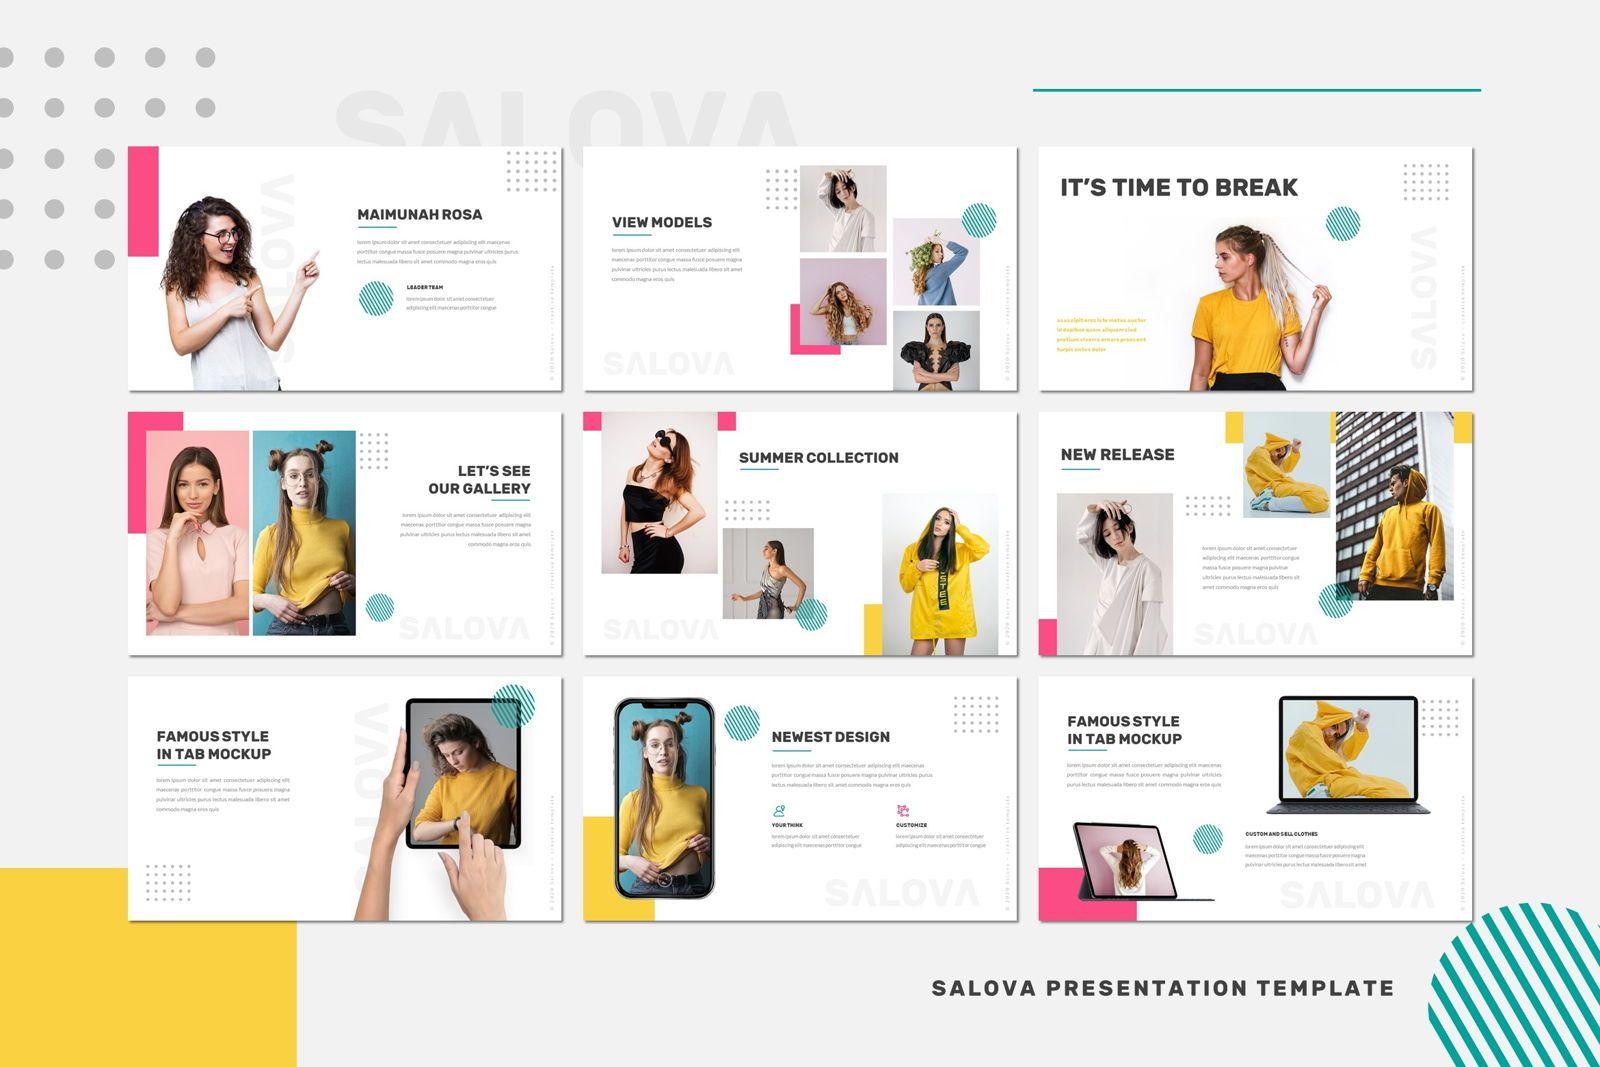 Salova - Google Slides Template, Slide 4, 07981, Presentation Templates — PoweredTemplate.com